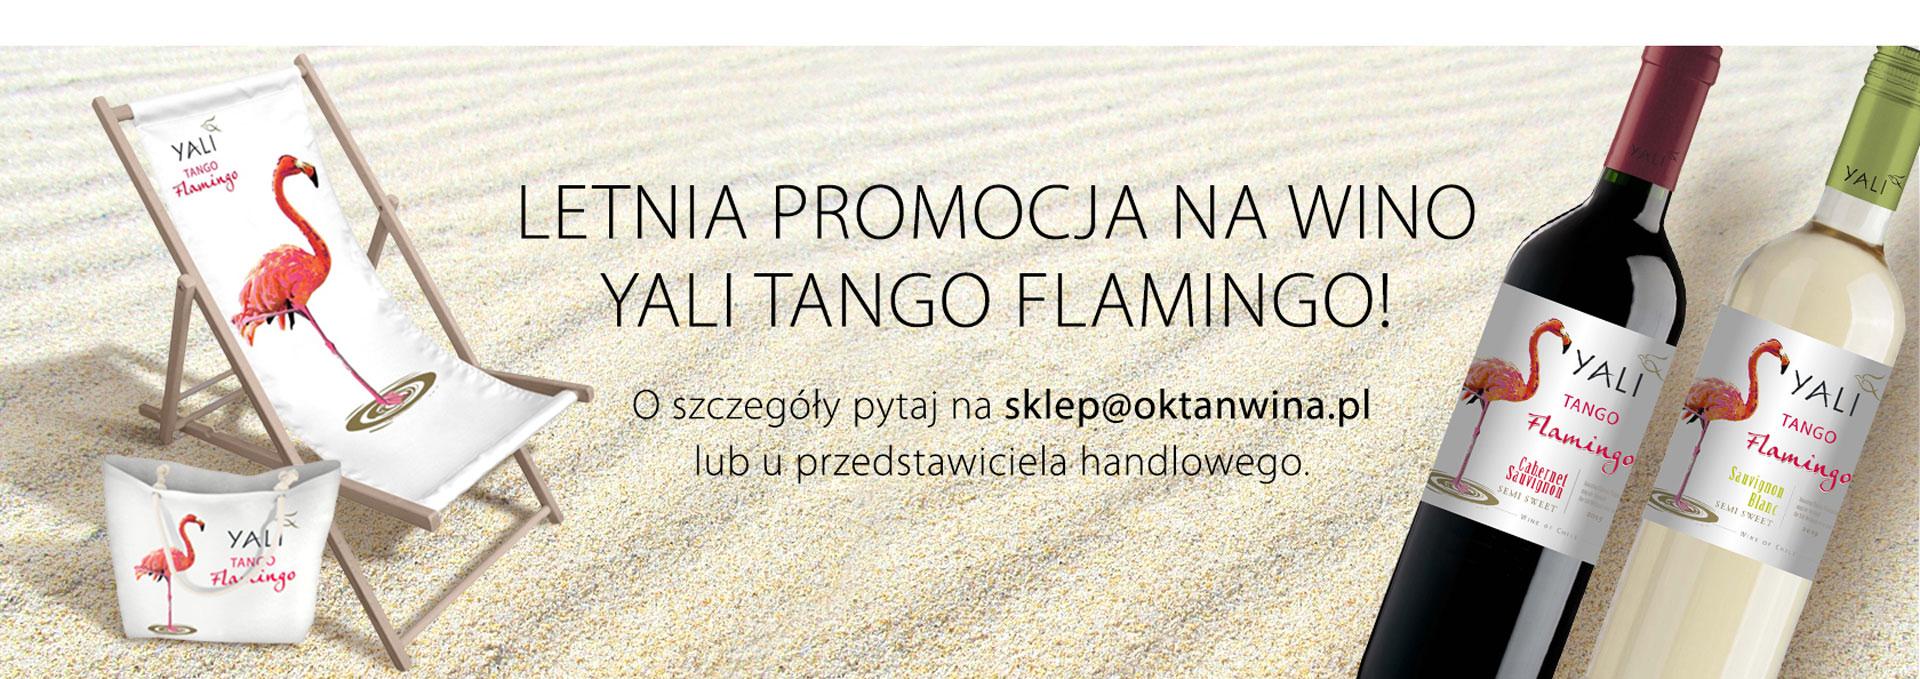 Letnia promocja na wino Yali Tango Flamingo!